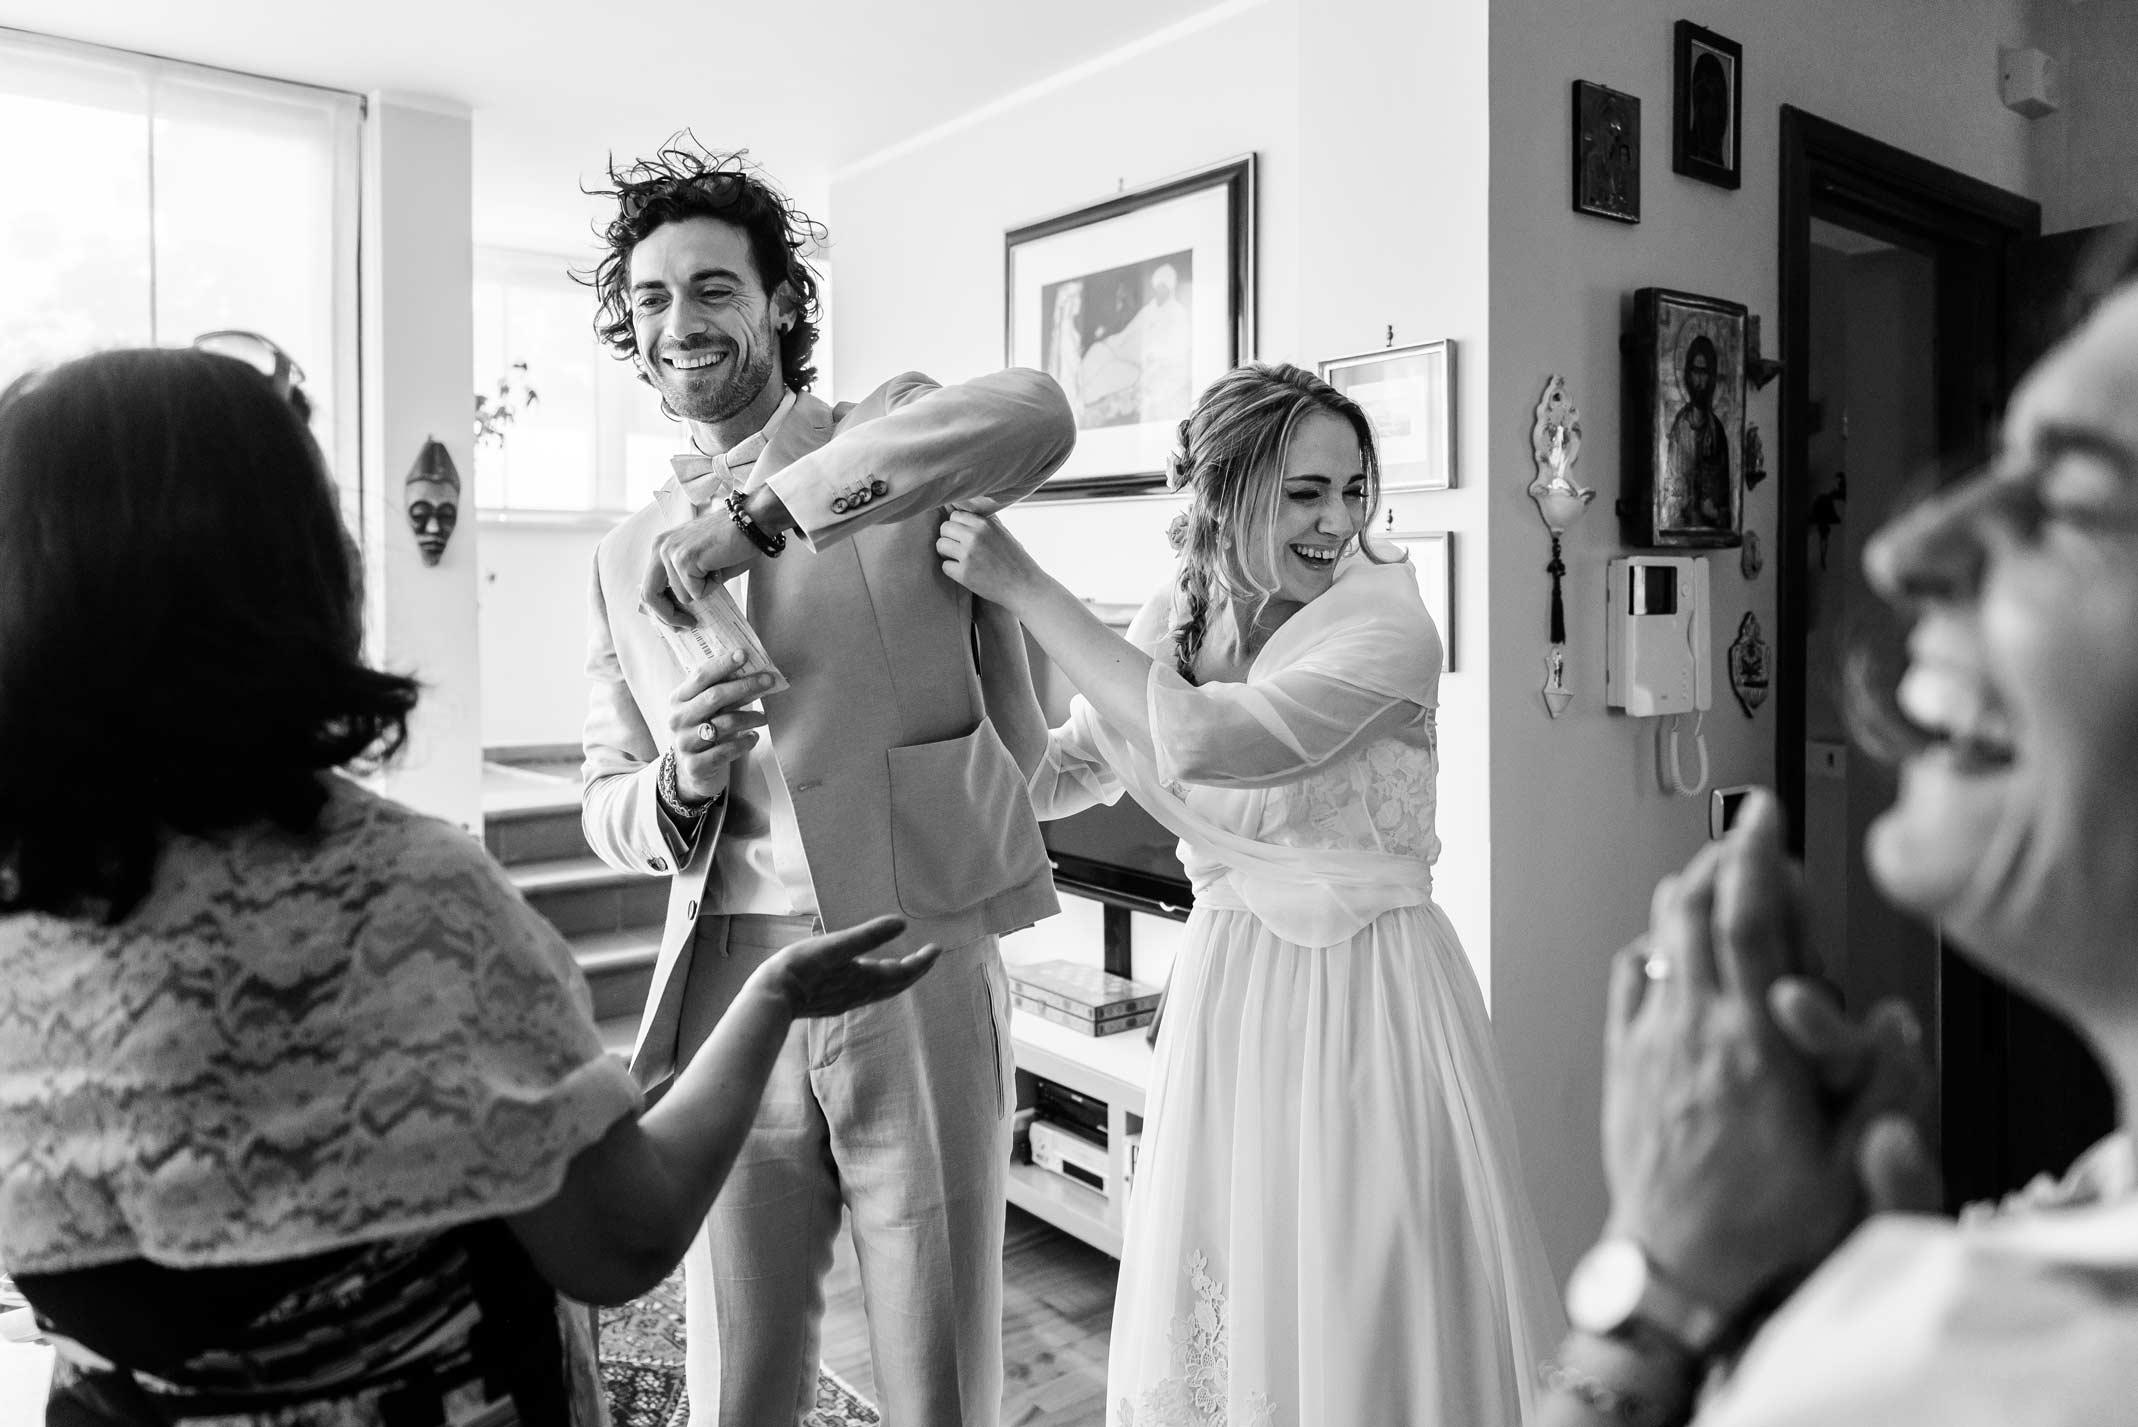 Fotografi-Matrimonio-Roma-Stile-Reportage-Preparativi-Sposa